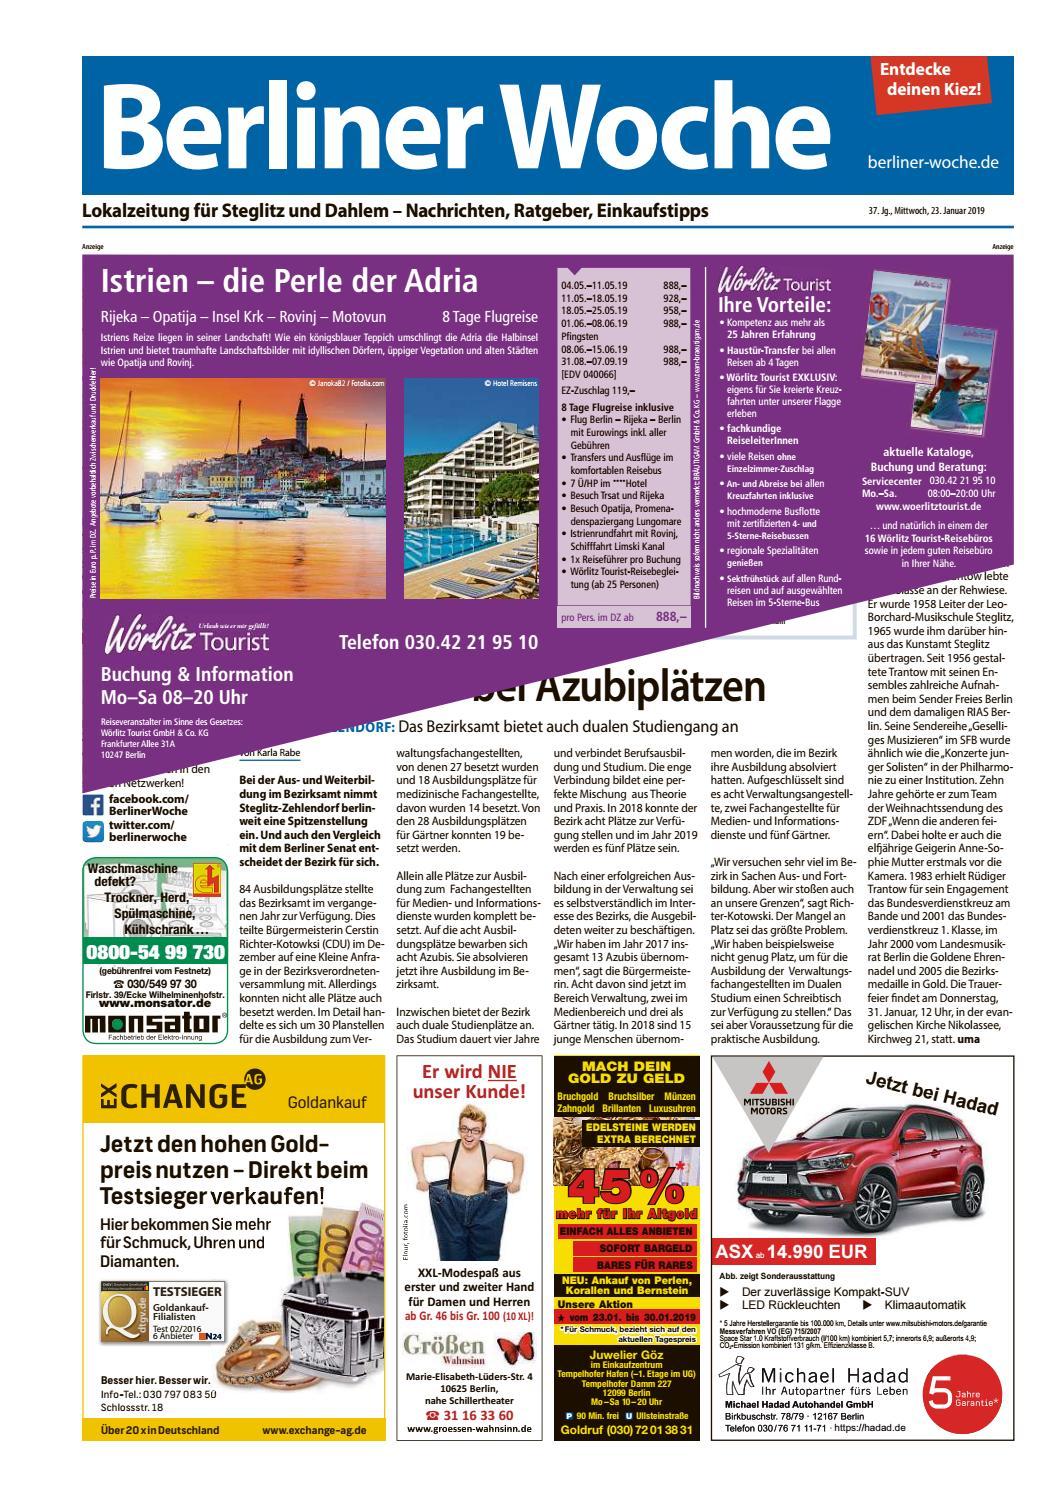 promo code a20d2 77626 L20 Steglitz Dahlem by Berliner Woche - issuu